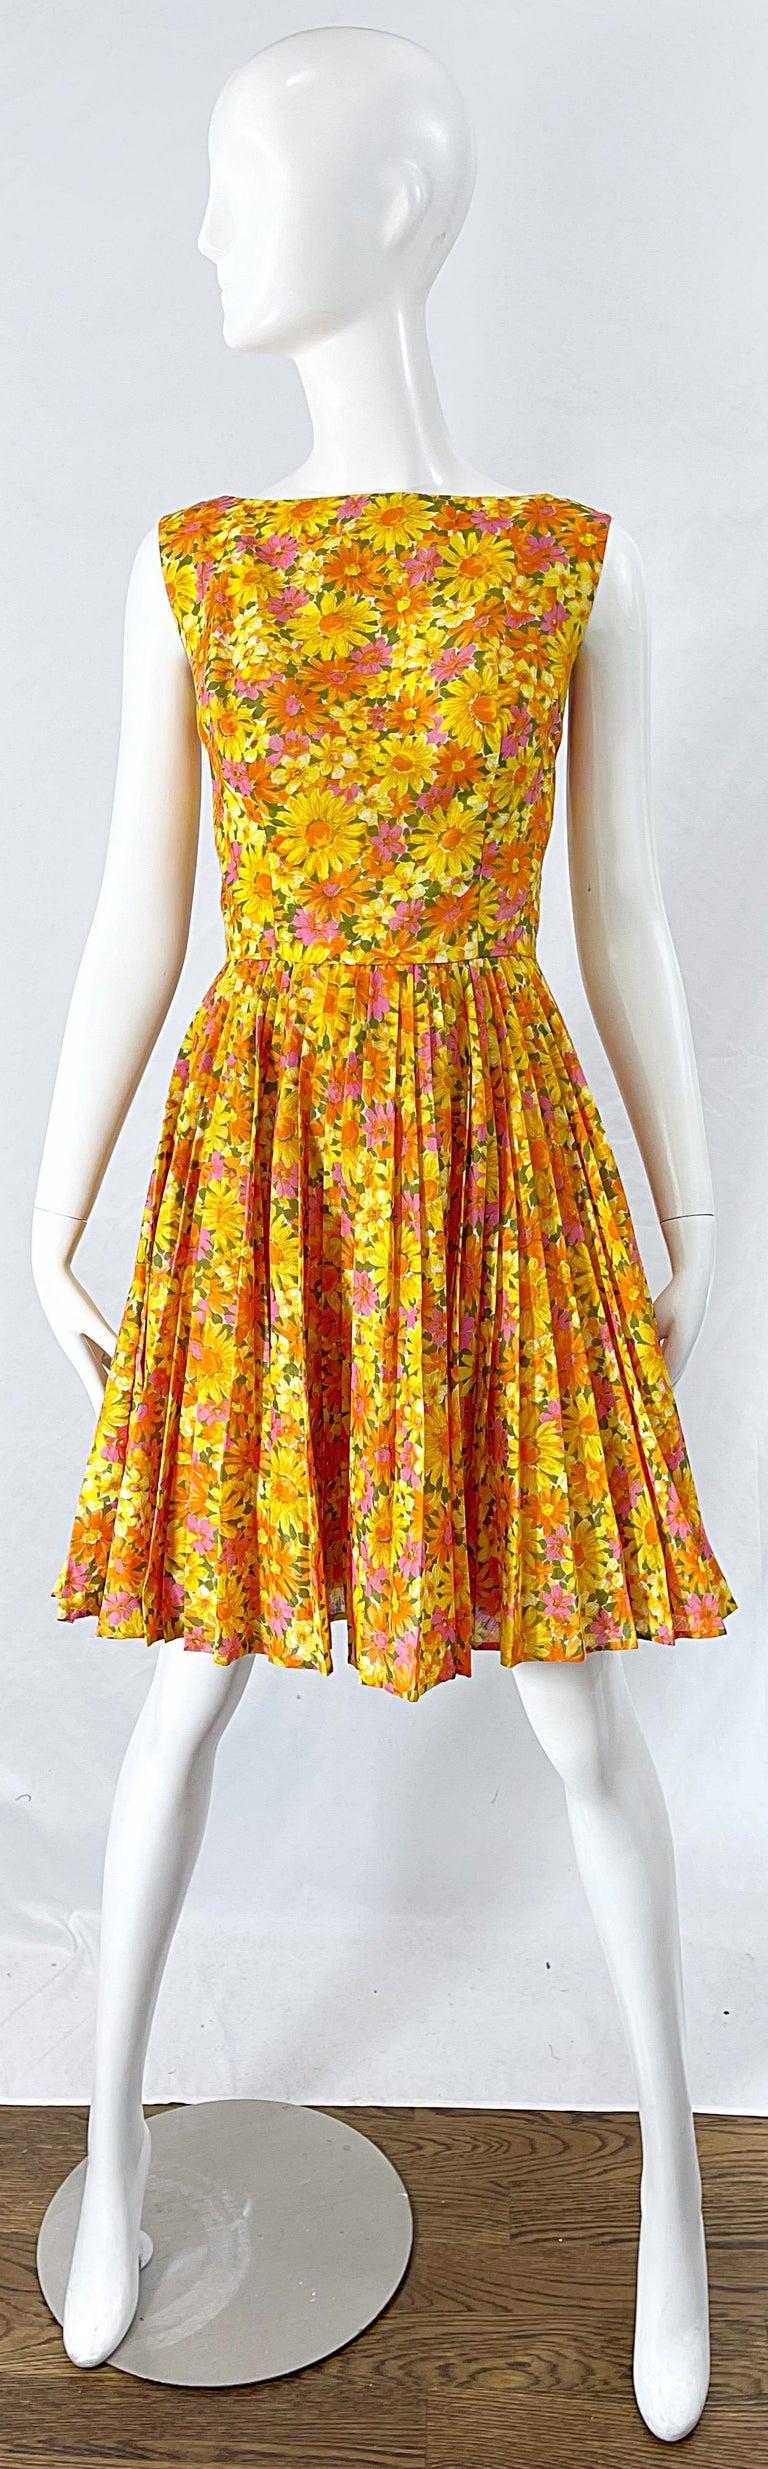 1950s Suzy Perette Yellow Pink Orange Daisy Print Cotton Vintage 50s Dress For Sale 9